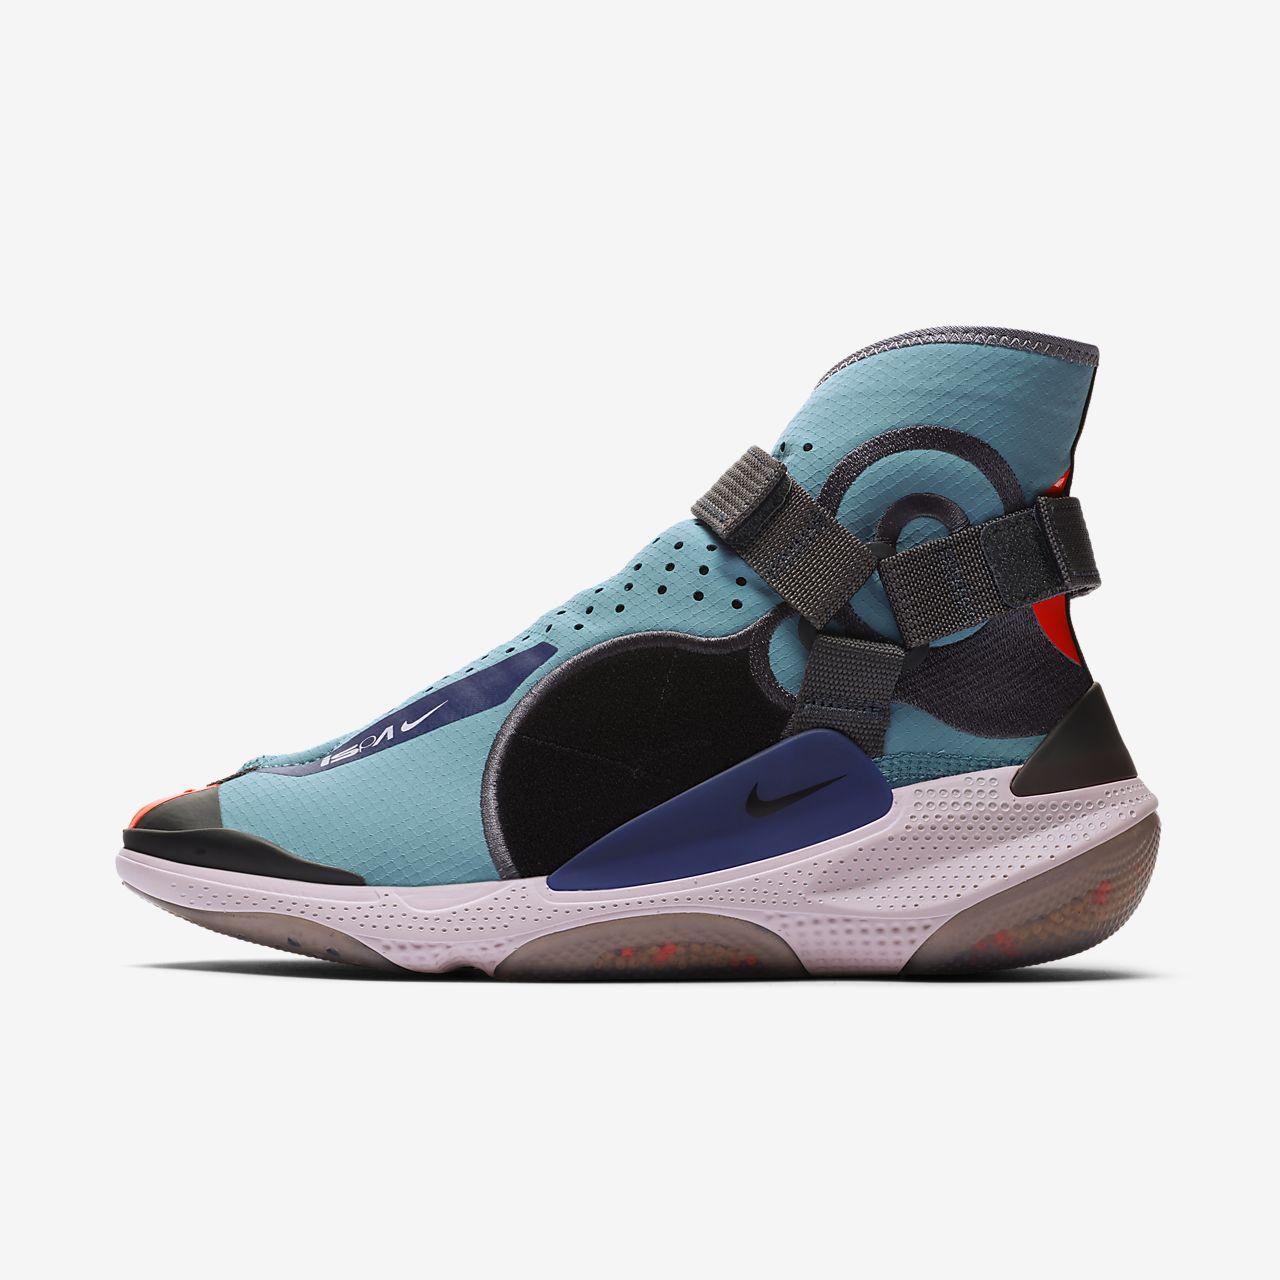 Calzado Nike ISPA Joyride Envelope